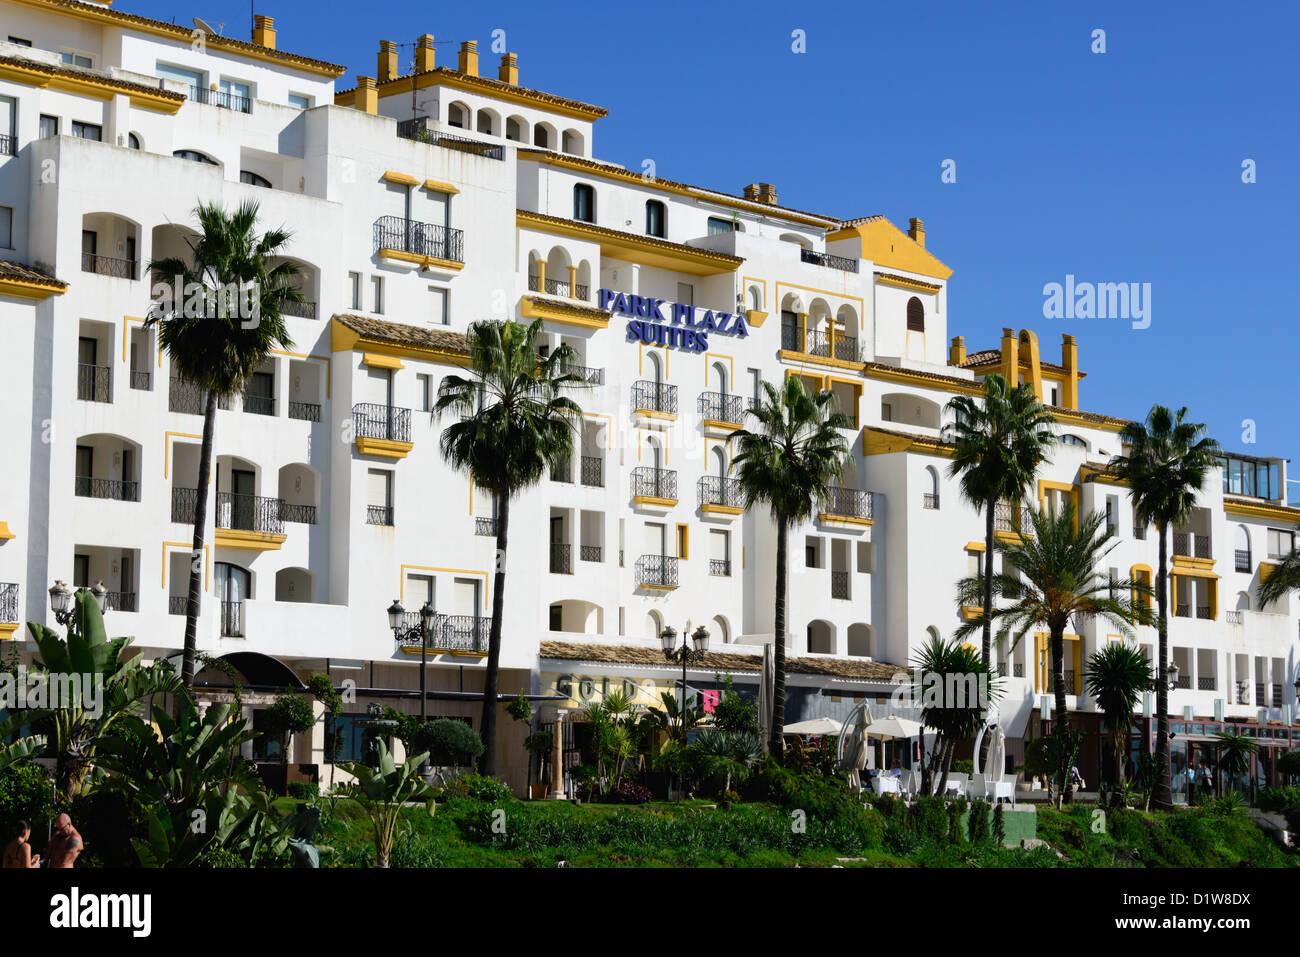 Park Plaza Suites Hotel Marbella Spain